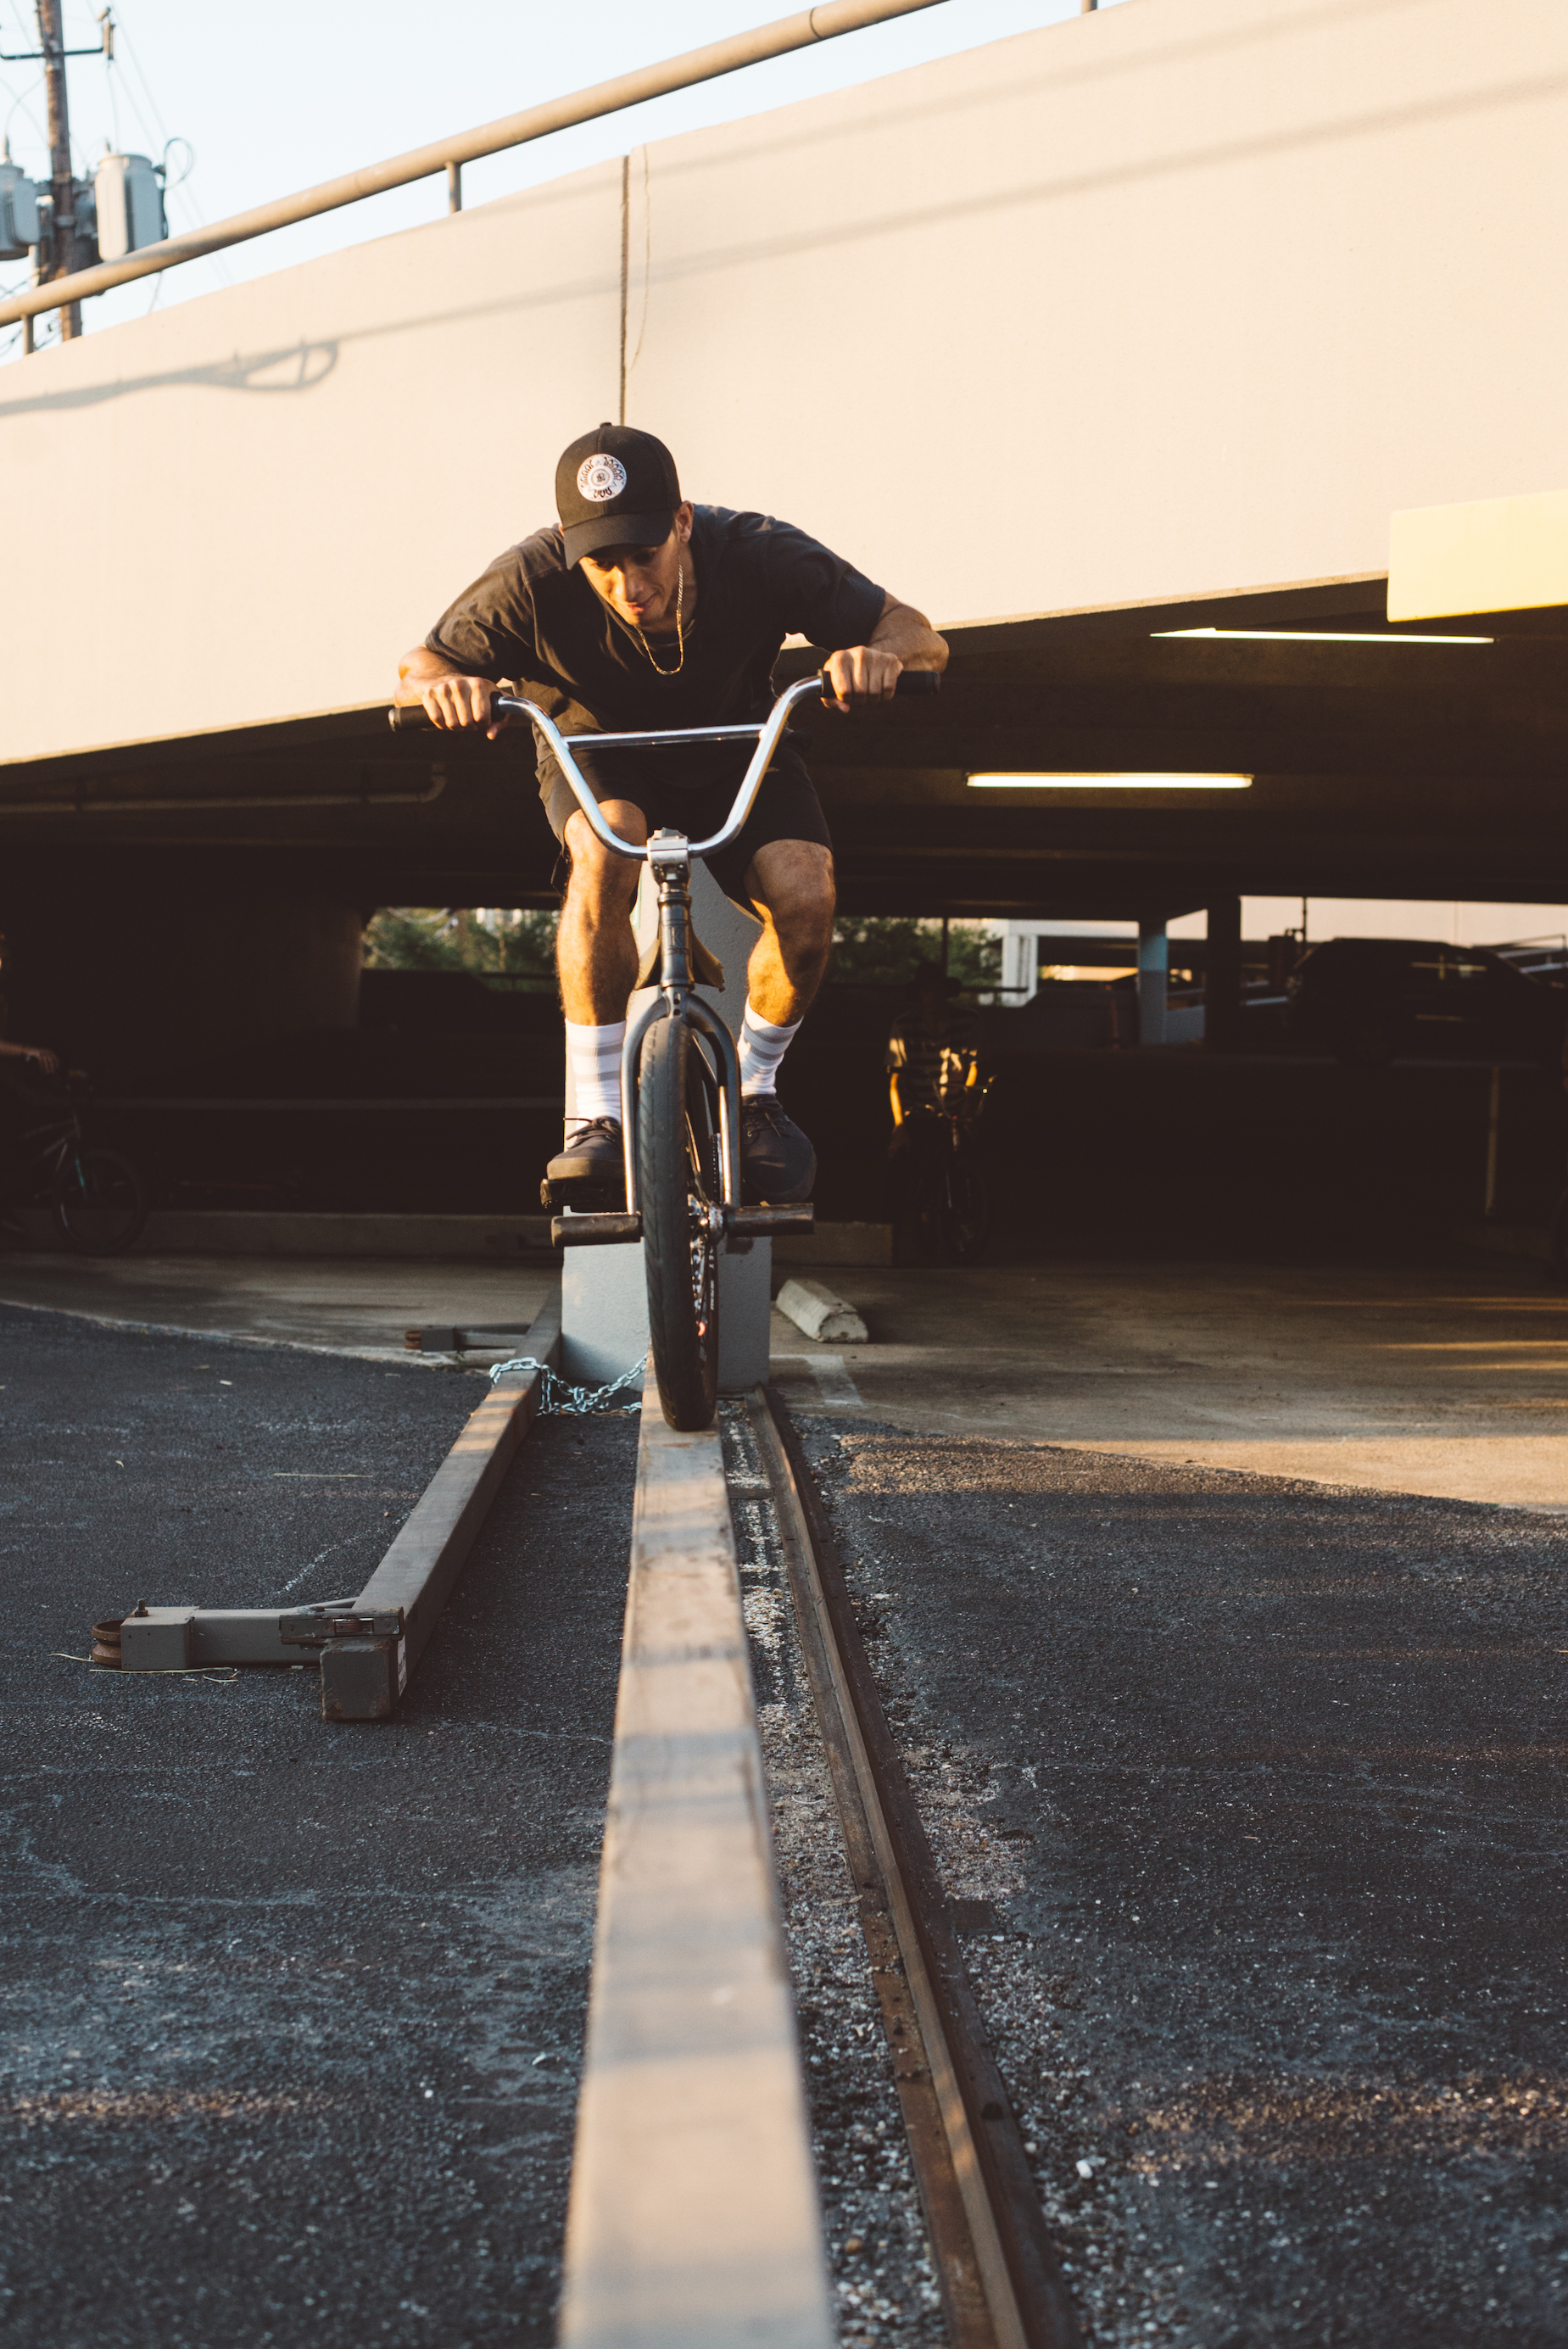 20171001 sunday street ride Kirby Crumpler_half res_19.jpg